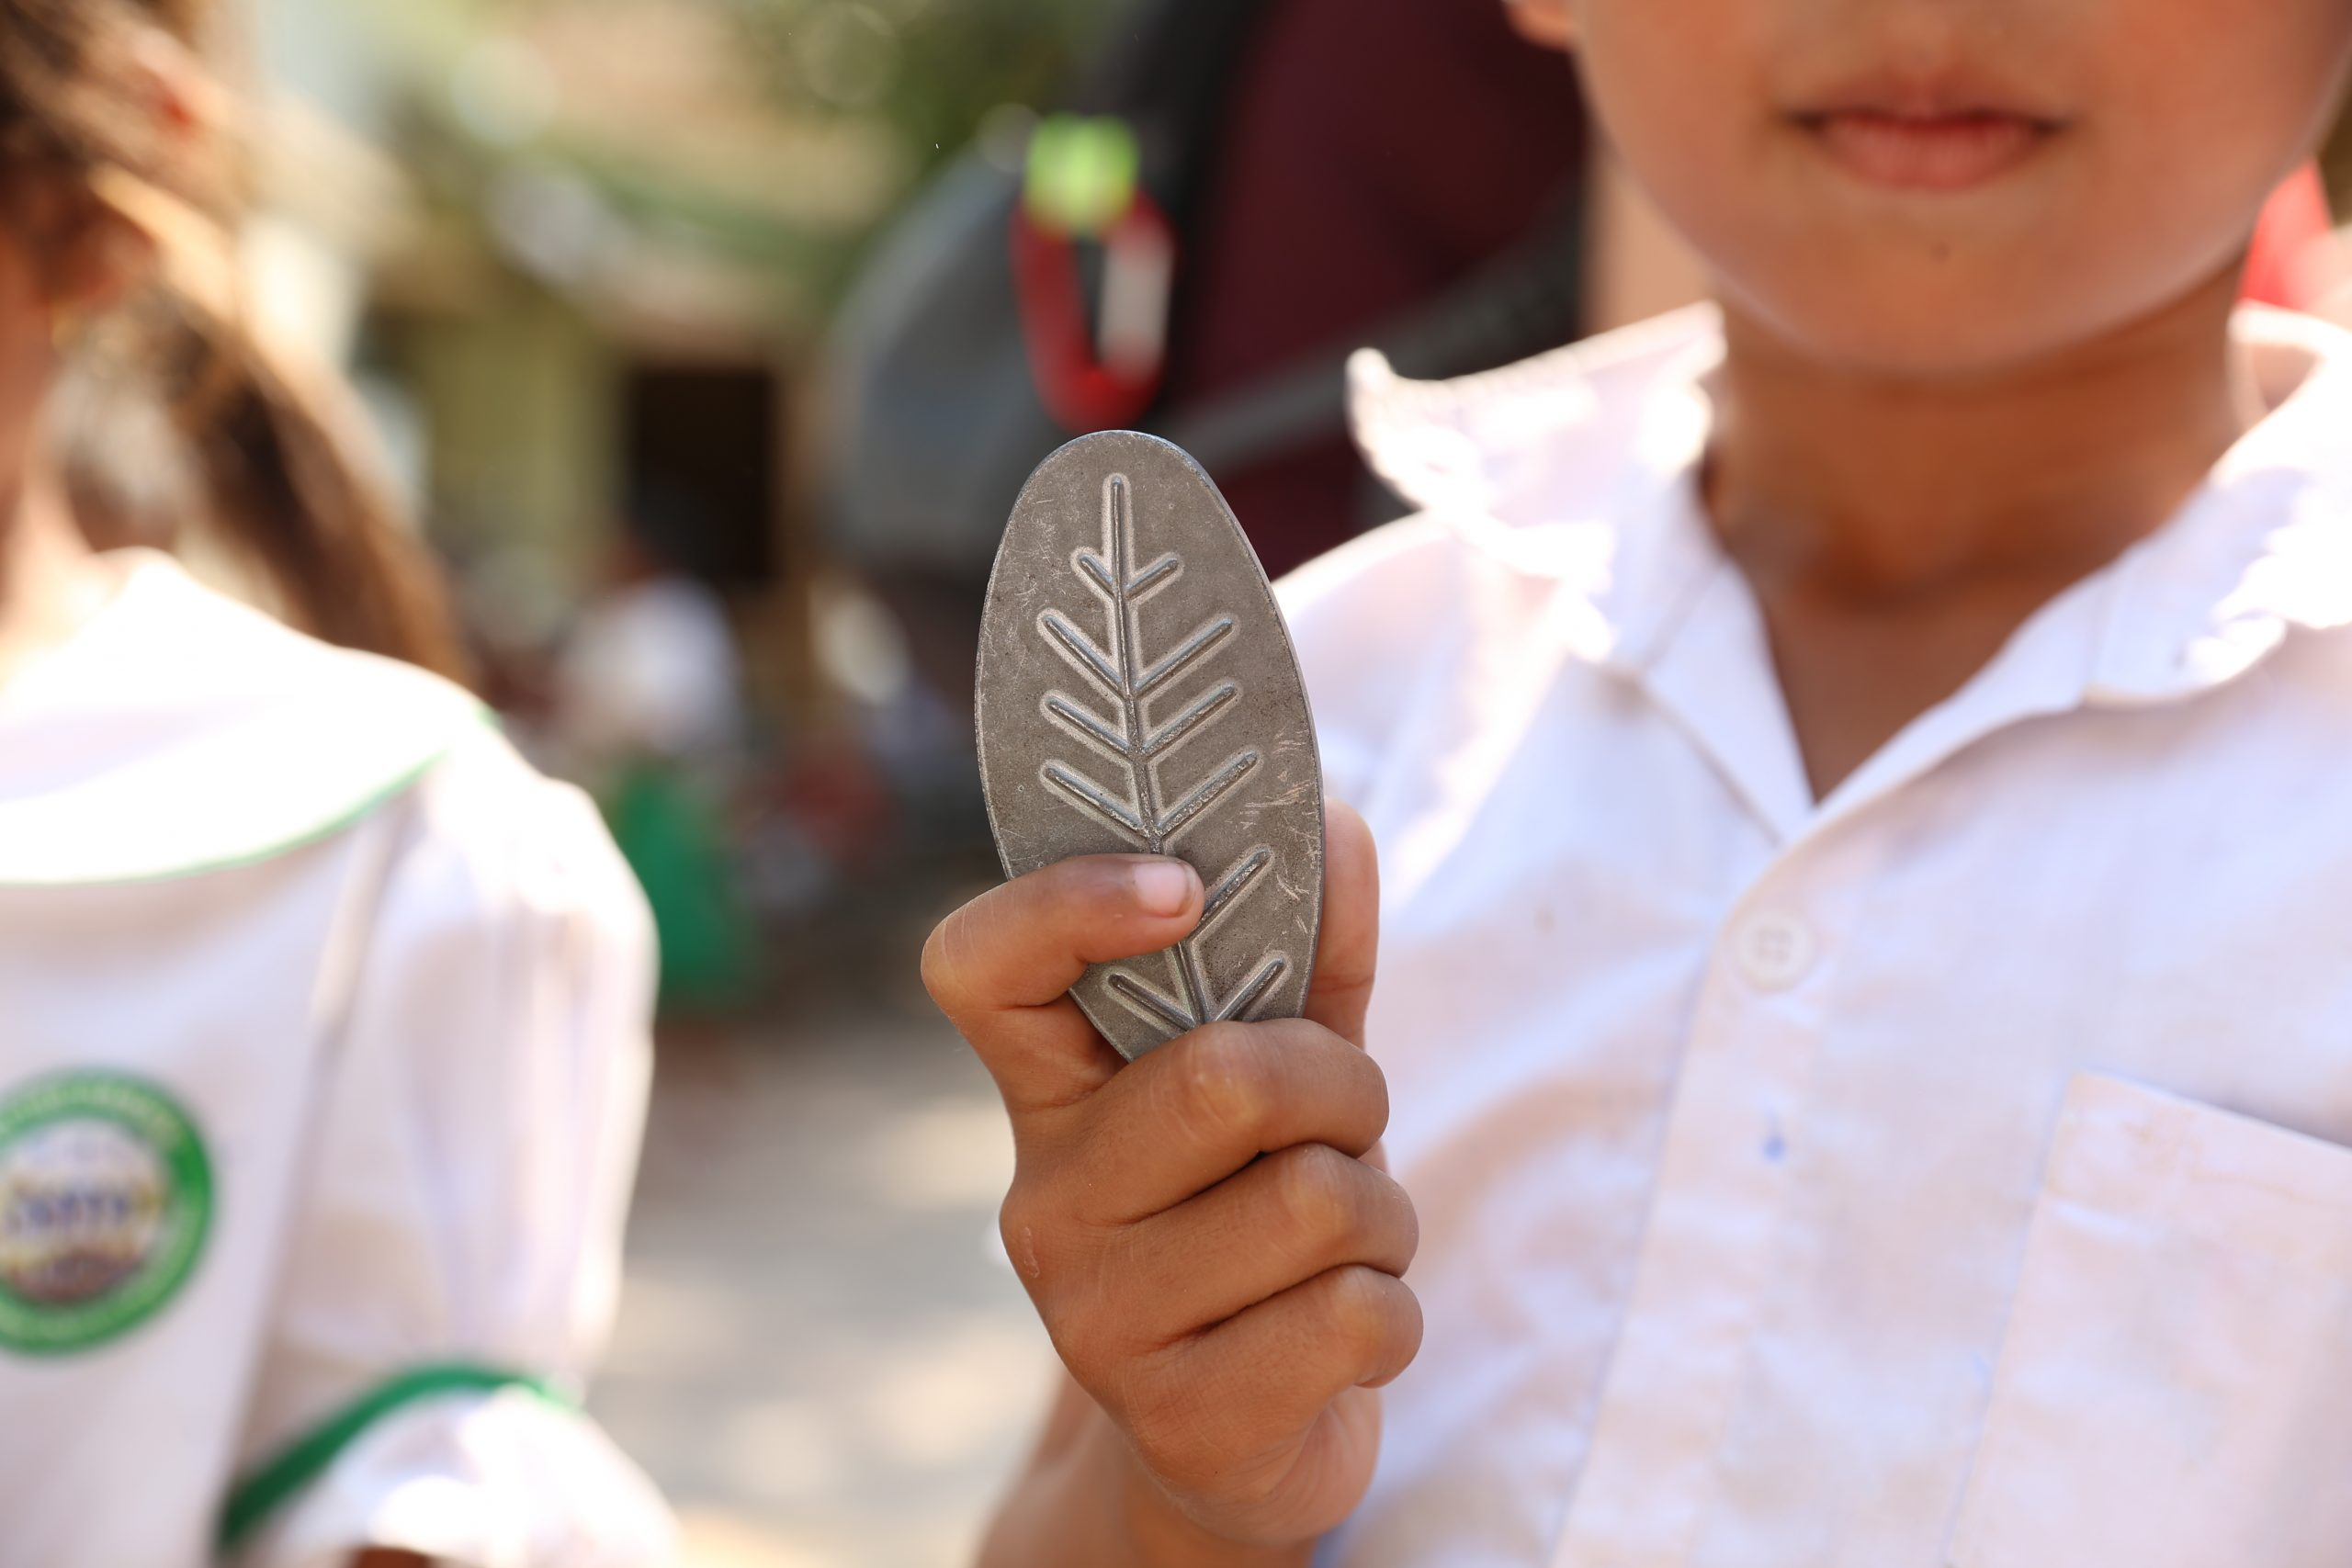 Child holding Lucky Iron Leaf